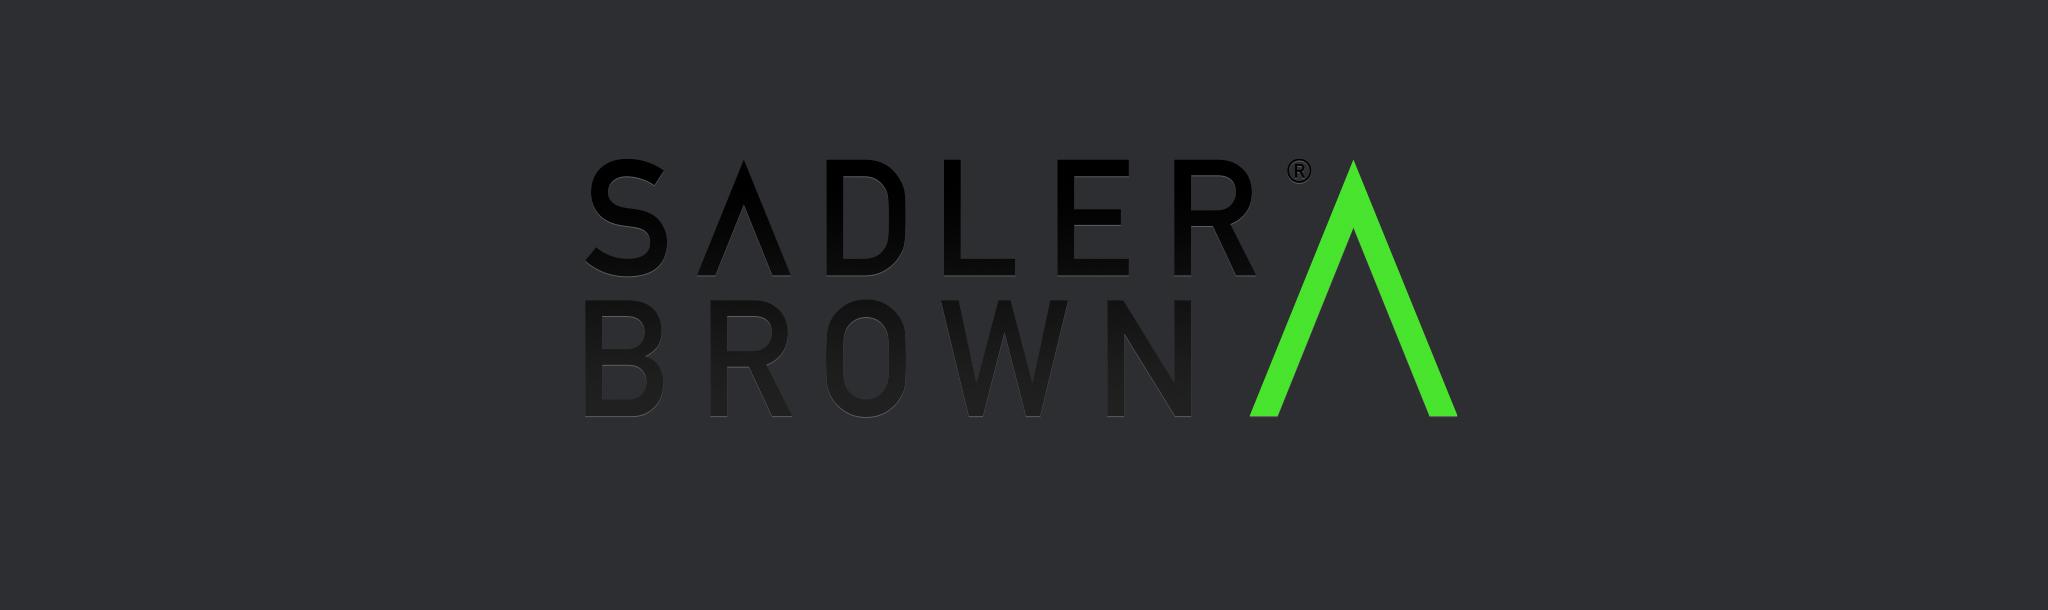 Sadler Brown Portfolio 8